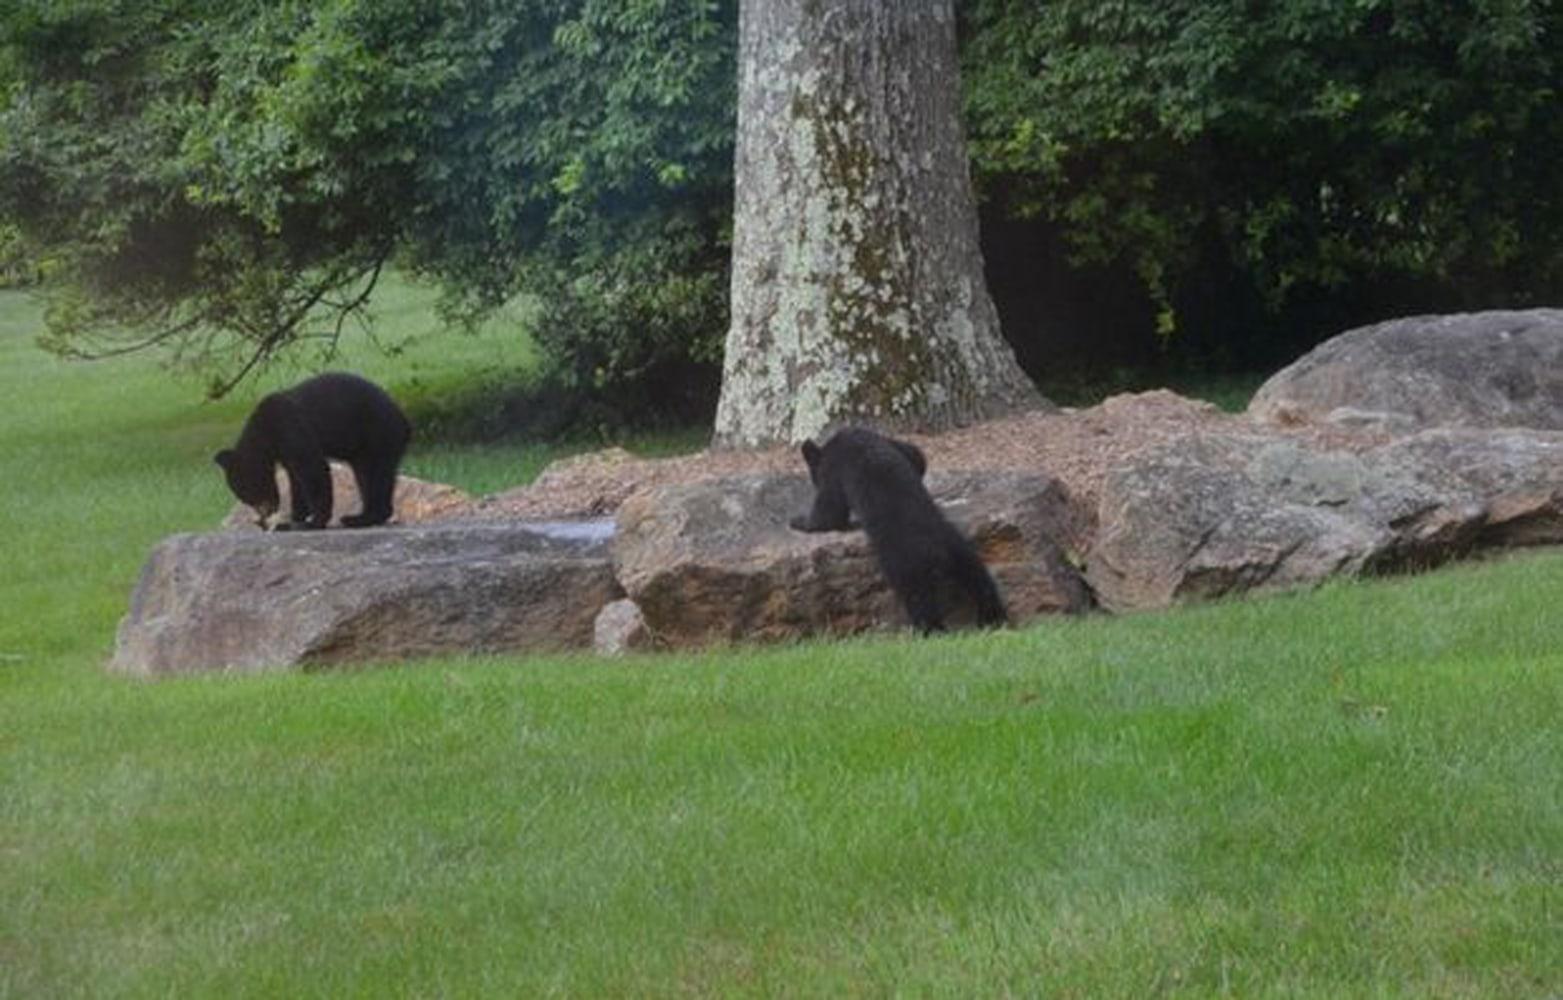 beary beary cute scene as bears play on slide in n j backyard